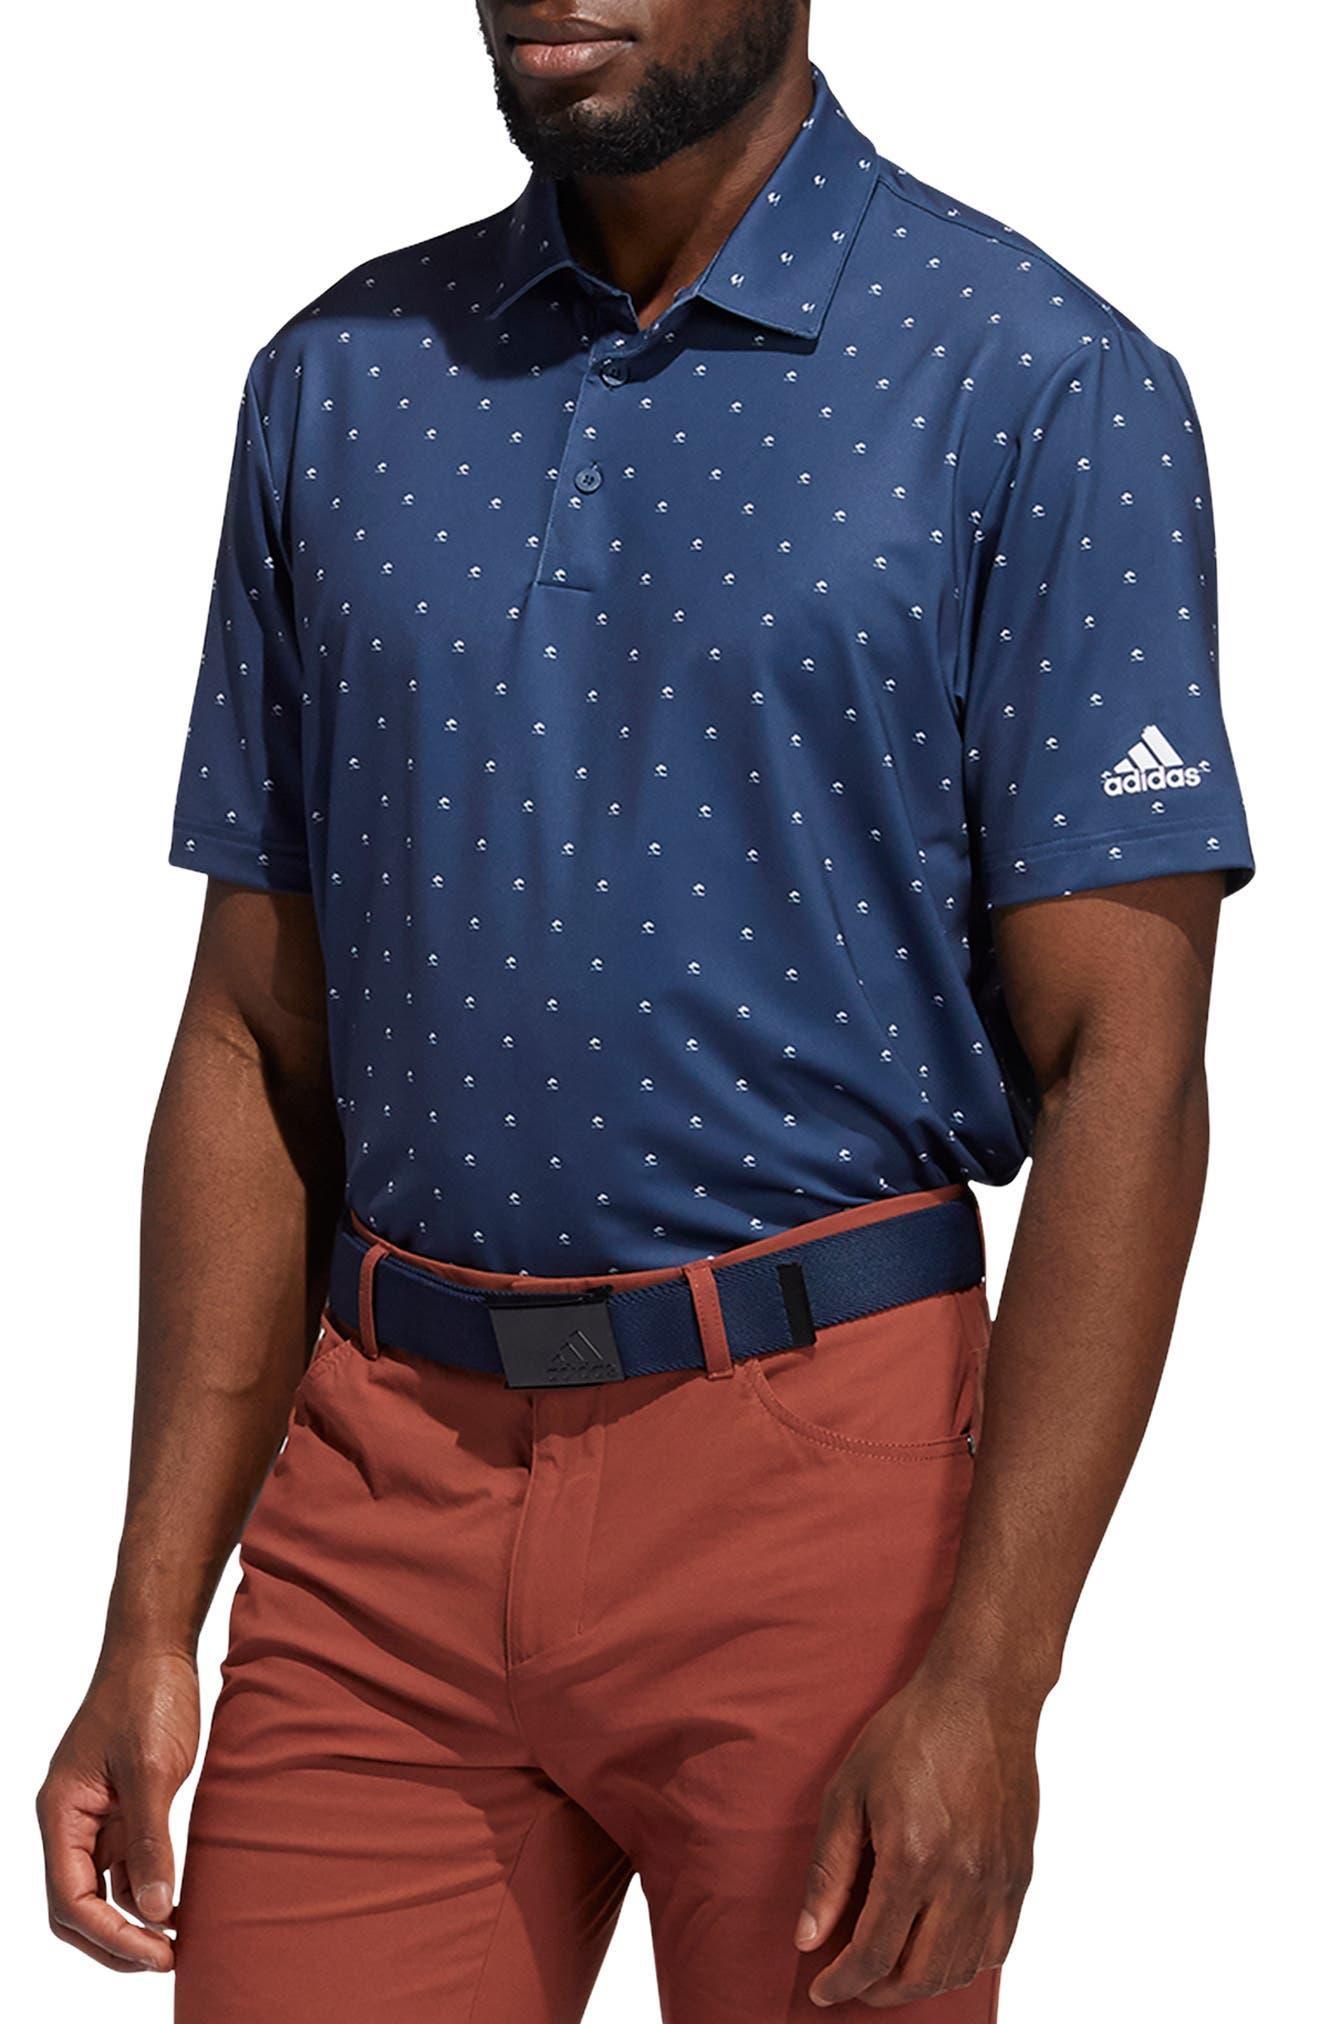 Men's Adidas Golf Ultimate 365 Performance Print Polo